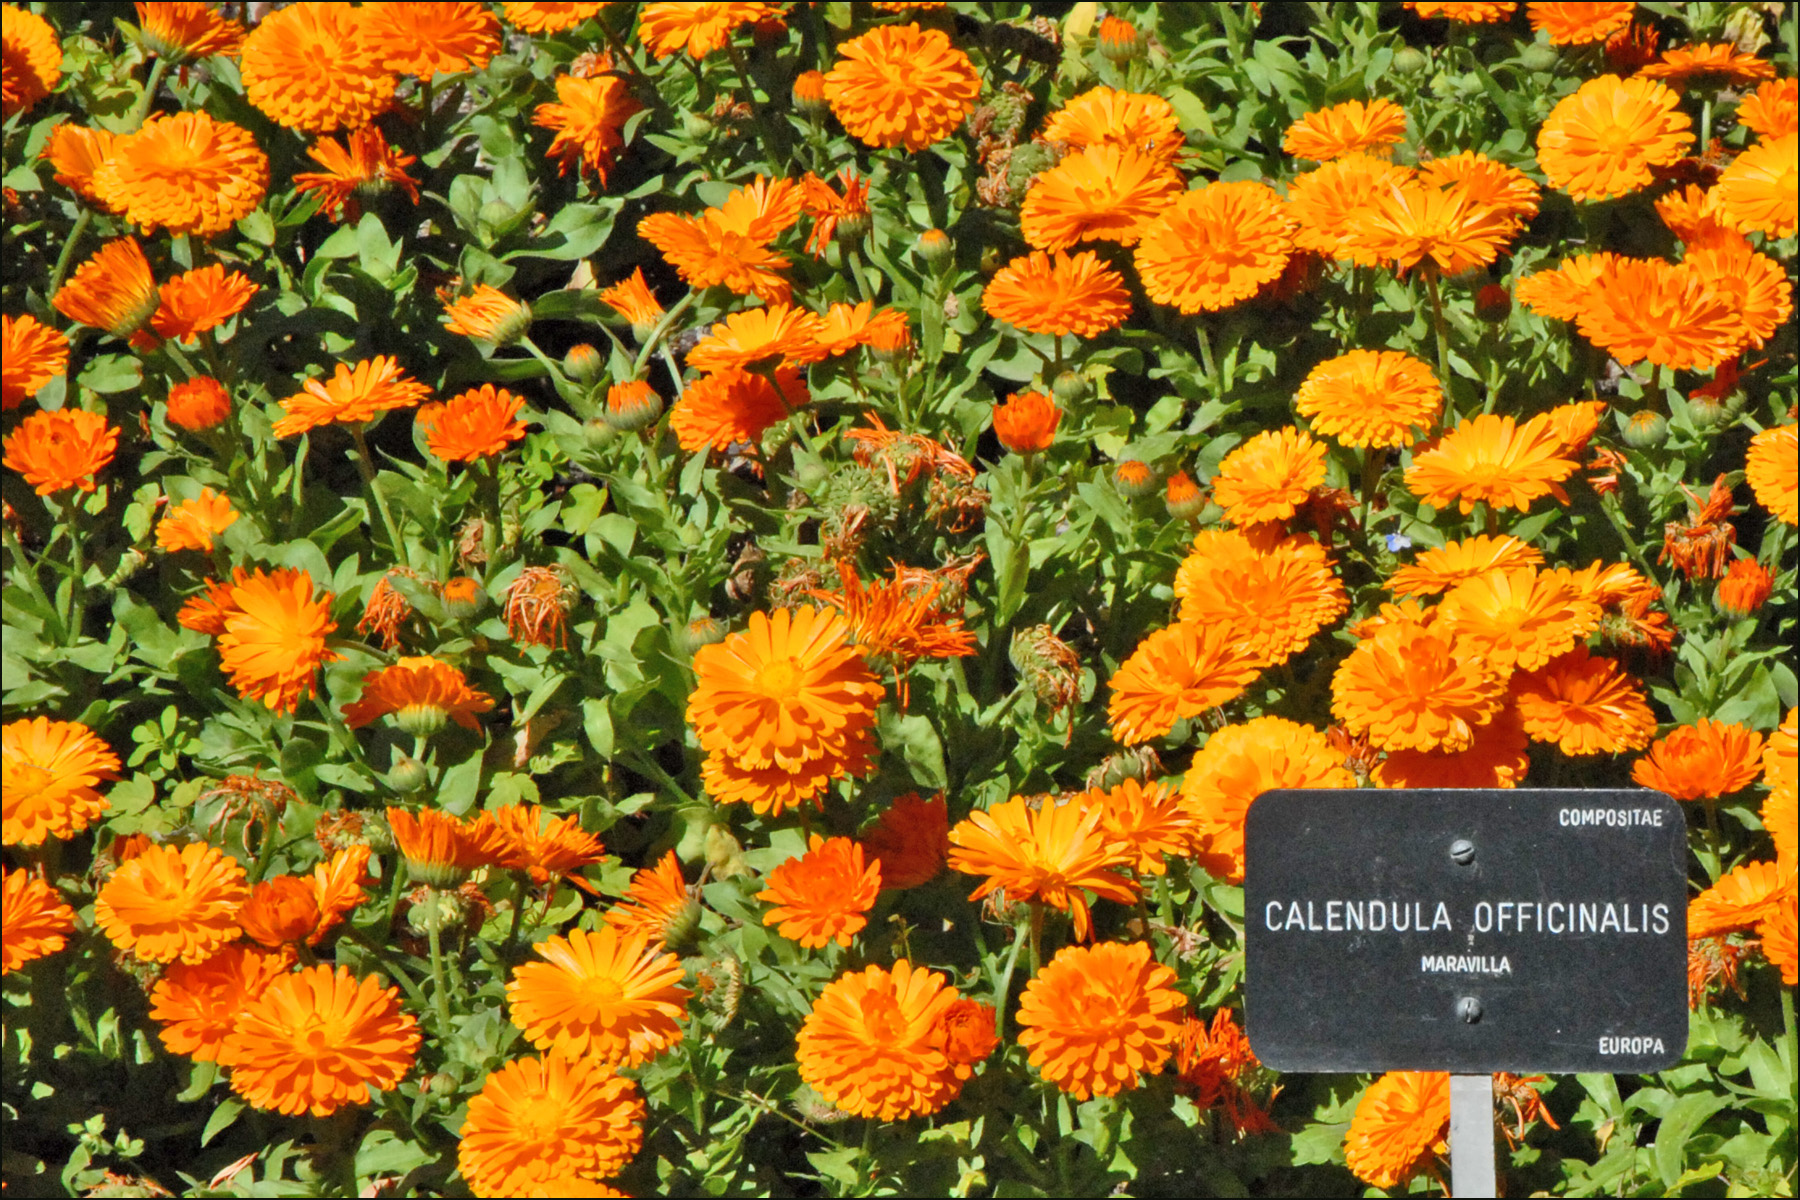 Calendula Officinalis (Real Jardin Botanico, Madrid) (4657015473).jpg